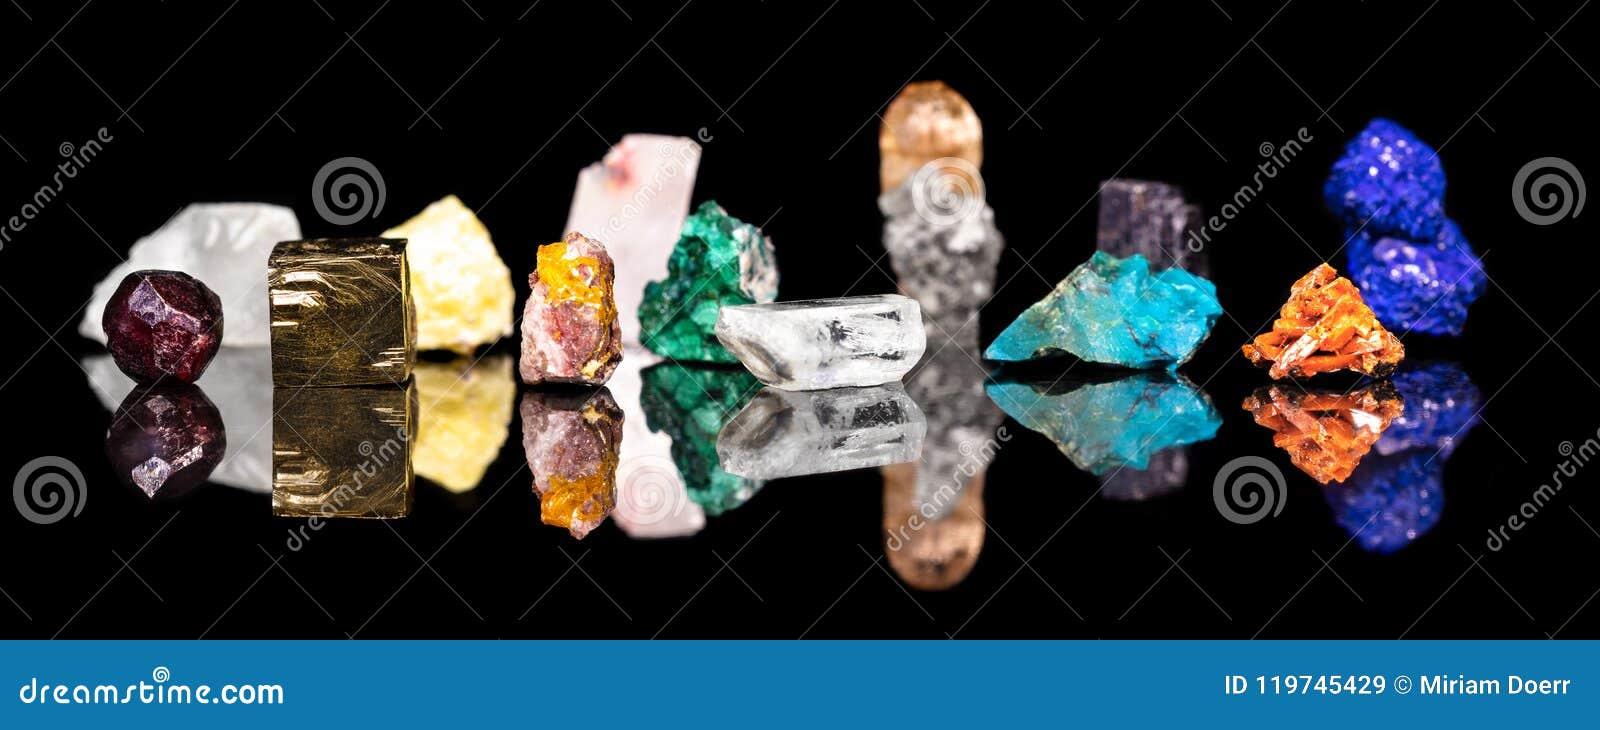 Header, variety of mineral gemstones and healing stones, natural